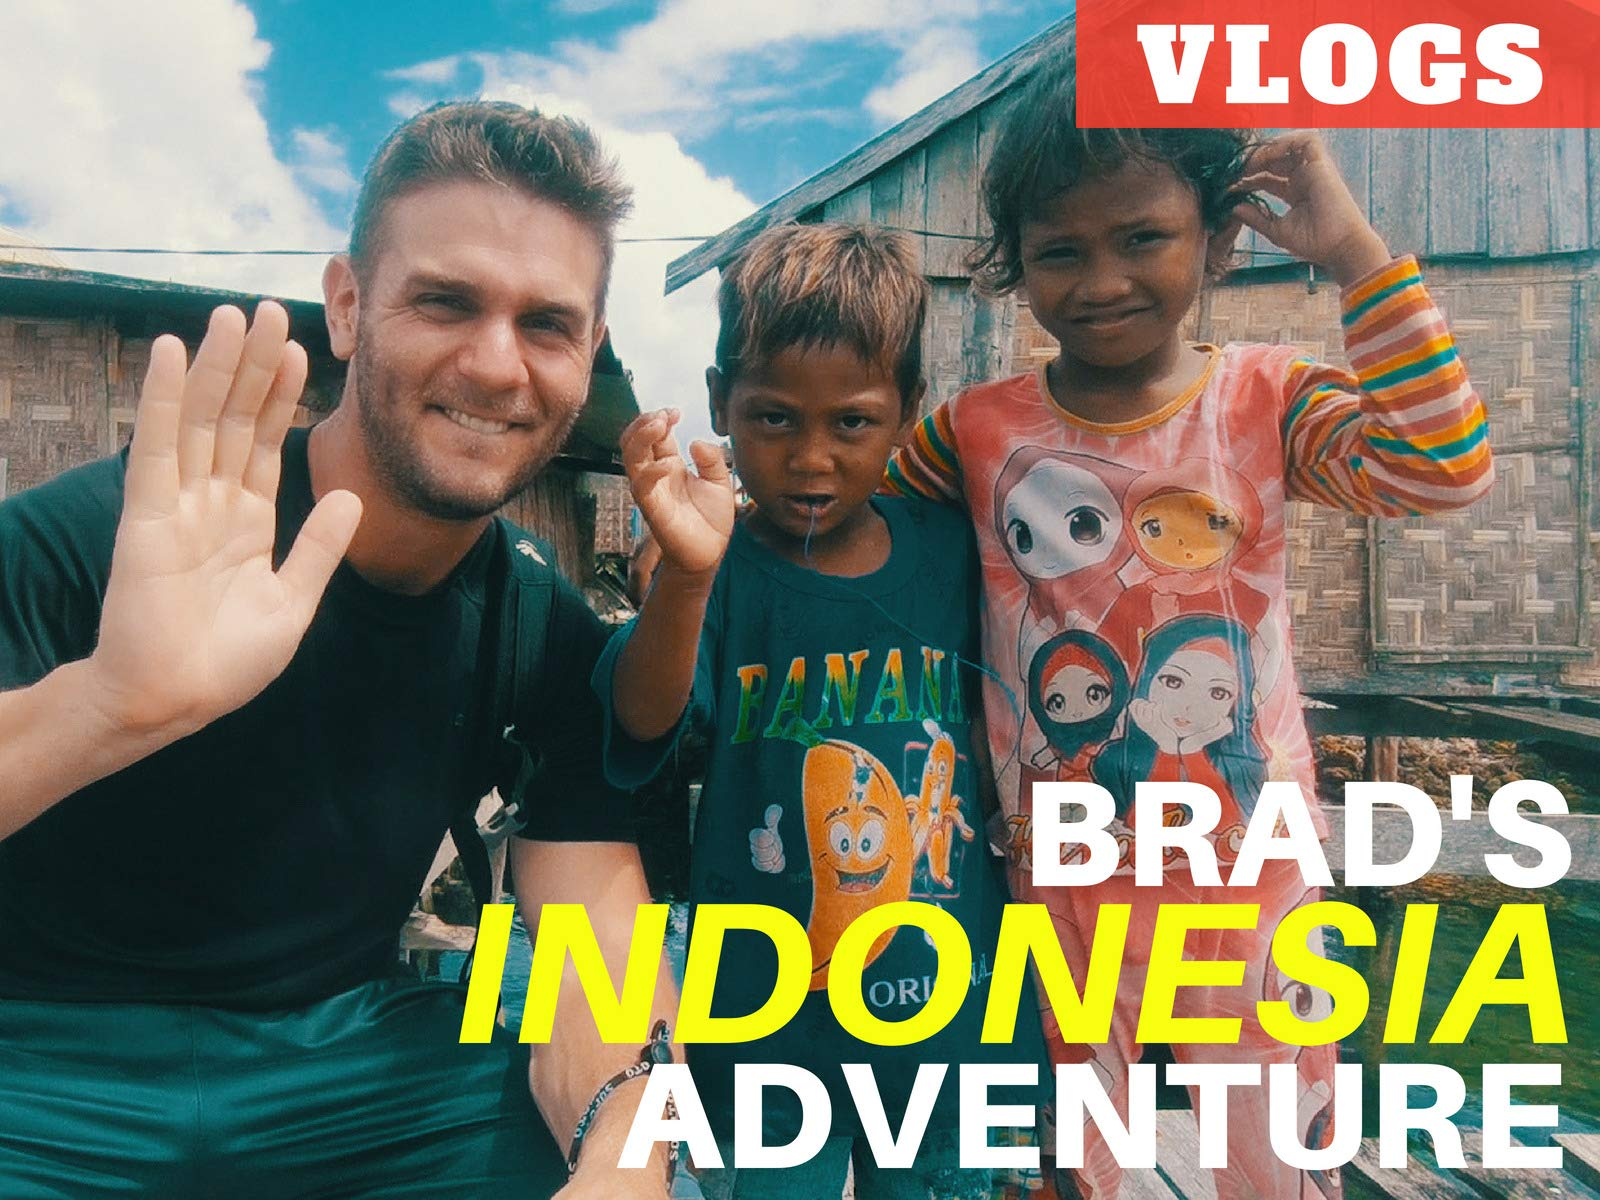 Brad's Indonesia Adventure Vlogs - Season 2